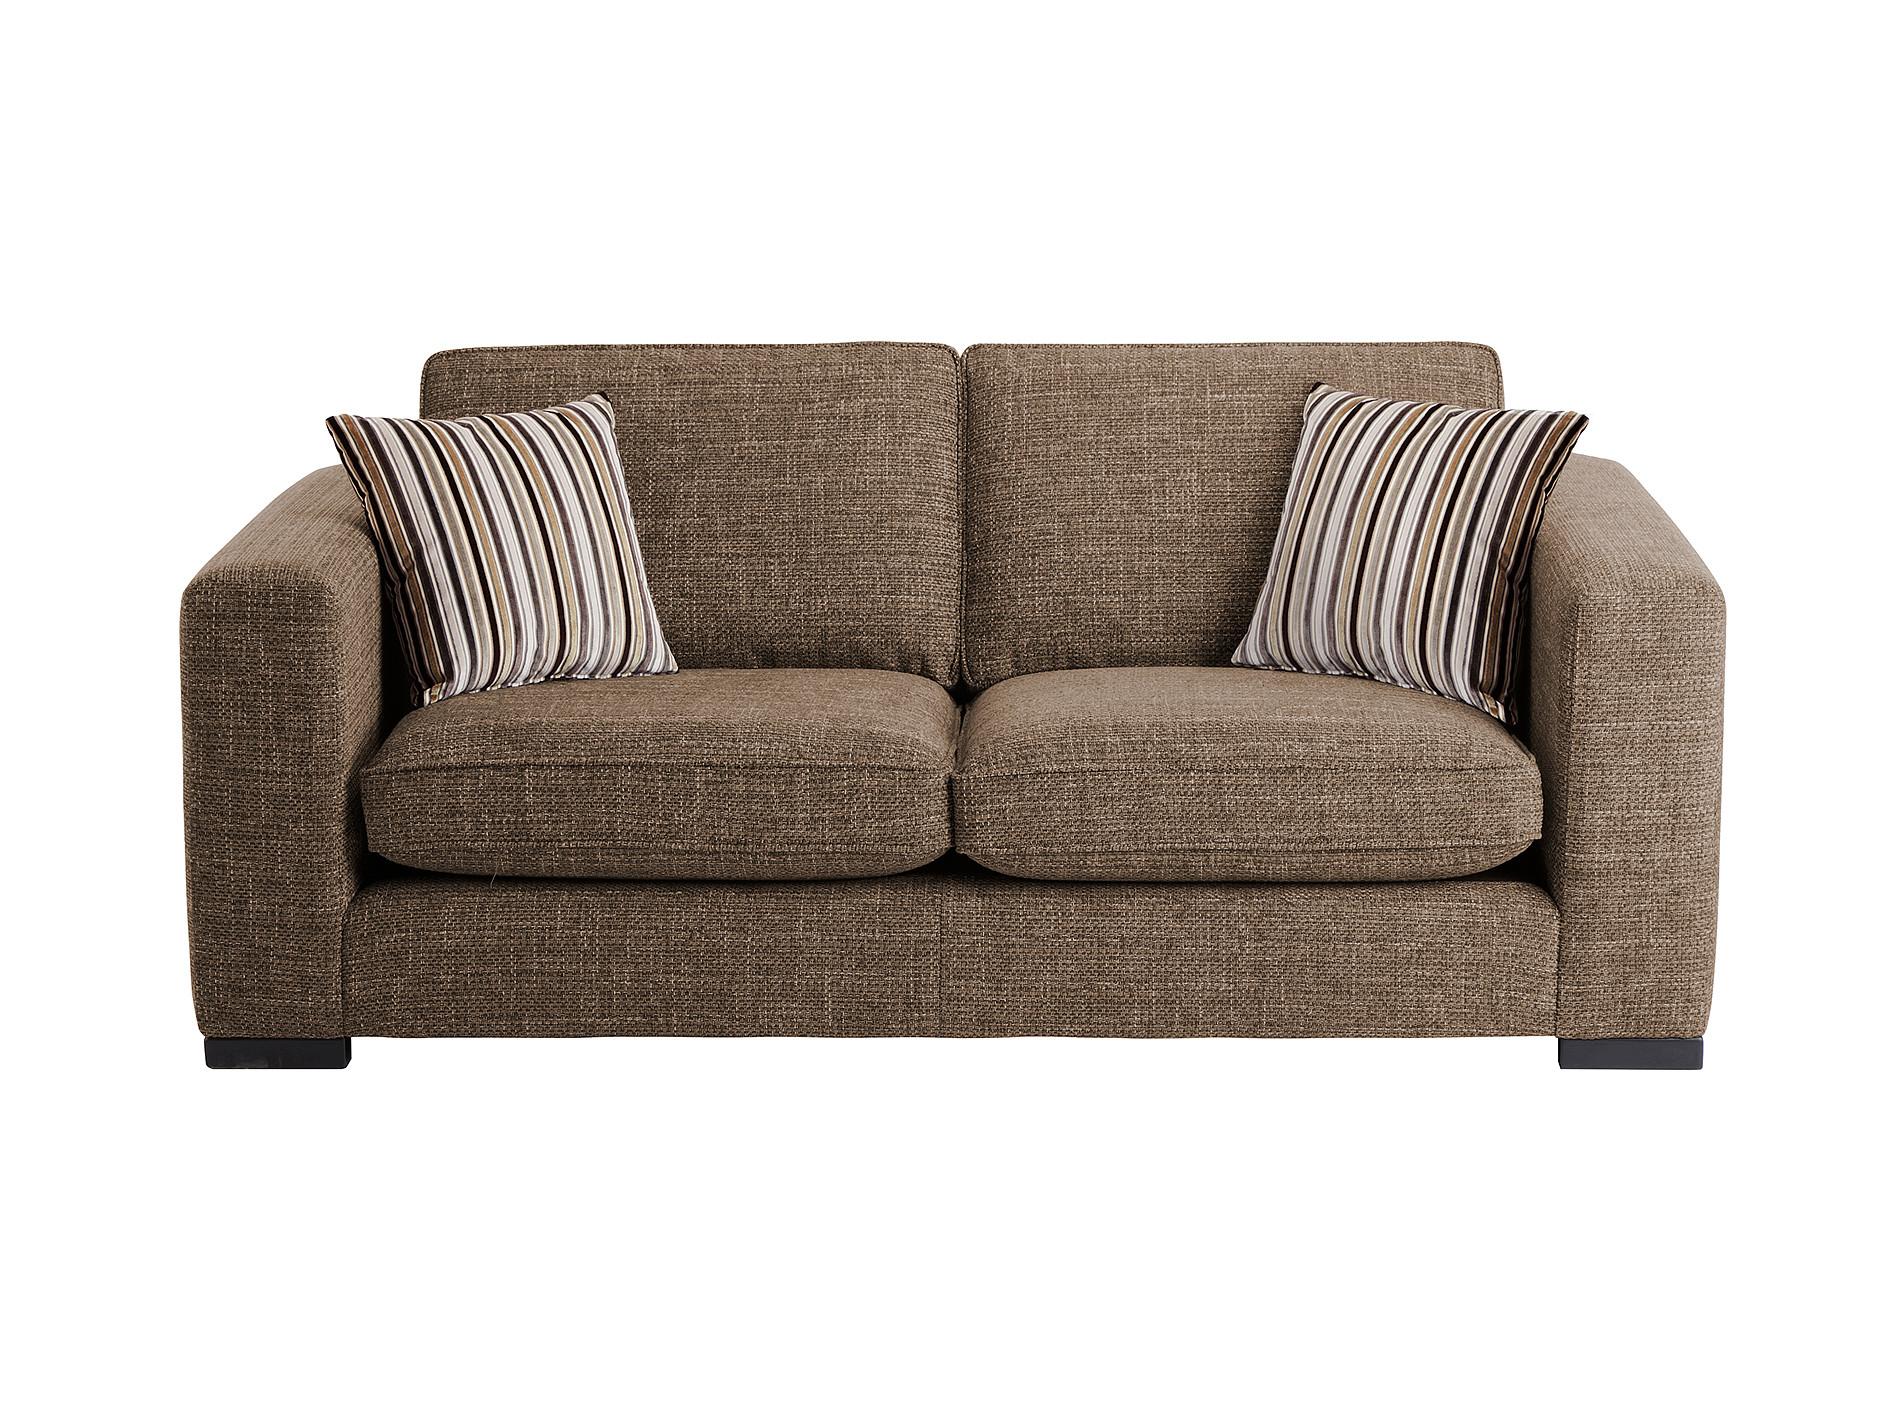 Genoa Small Sofa In Casual Taupe